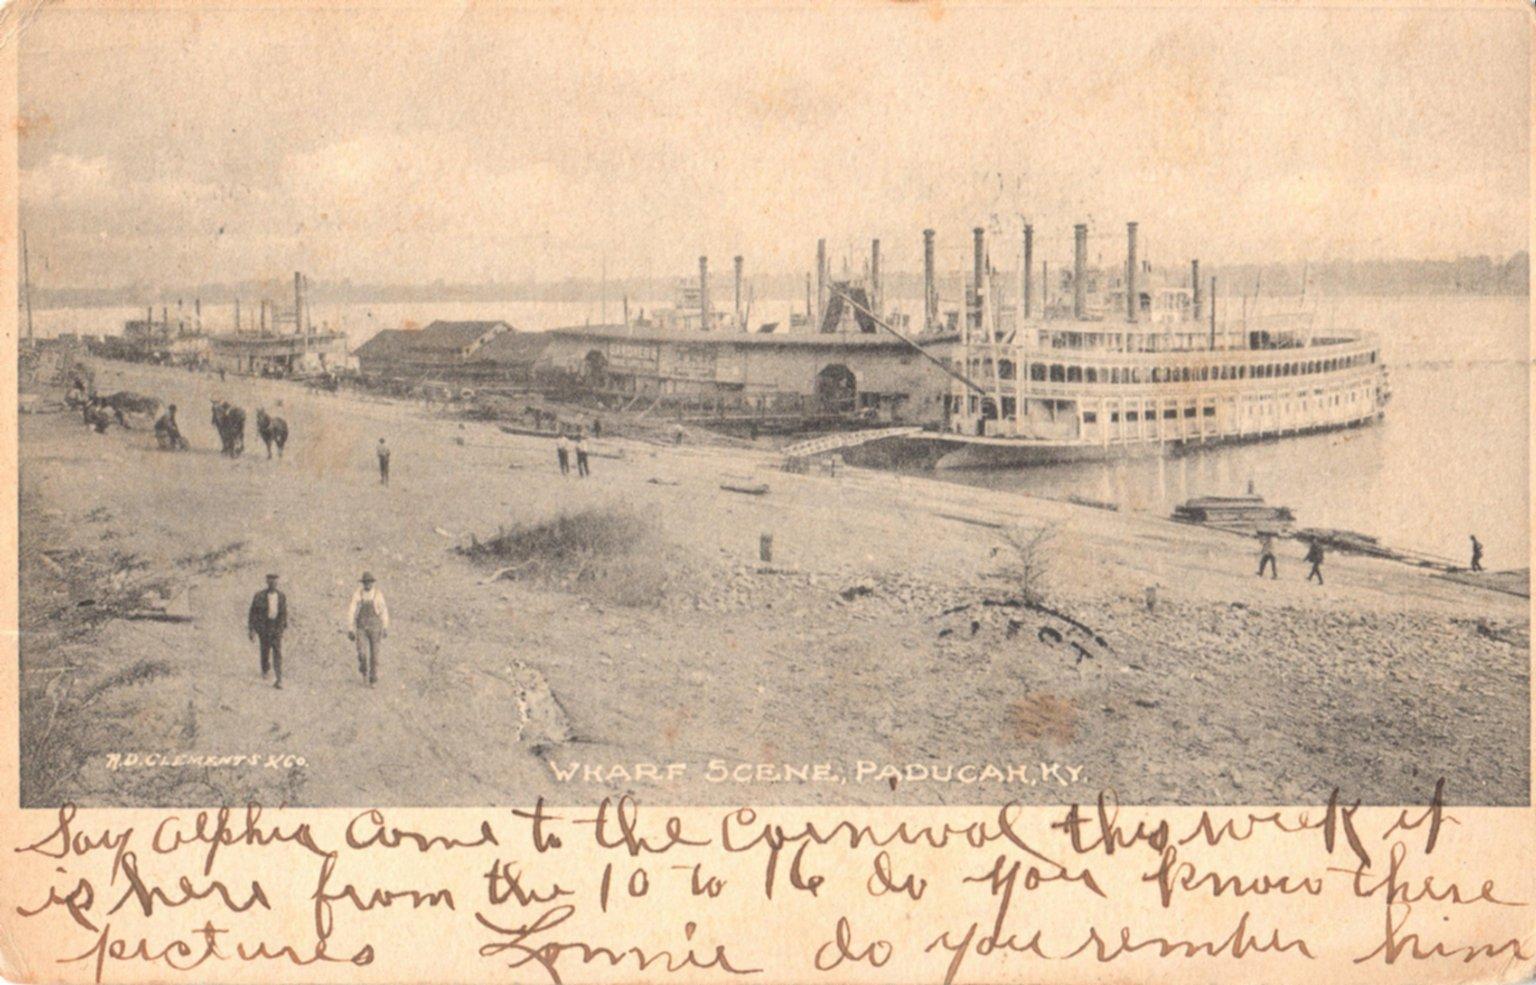 Wharf Scene, Paducah, KY.